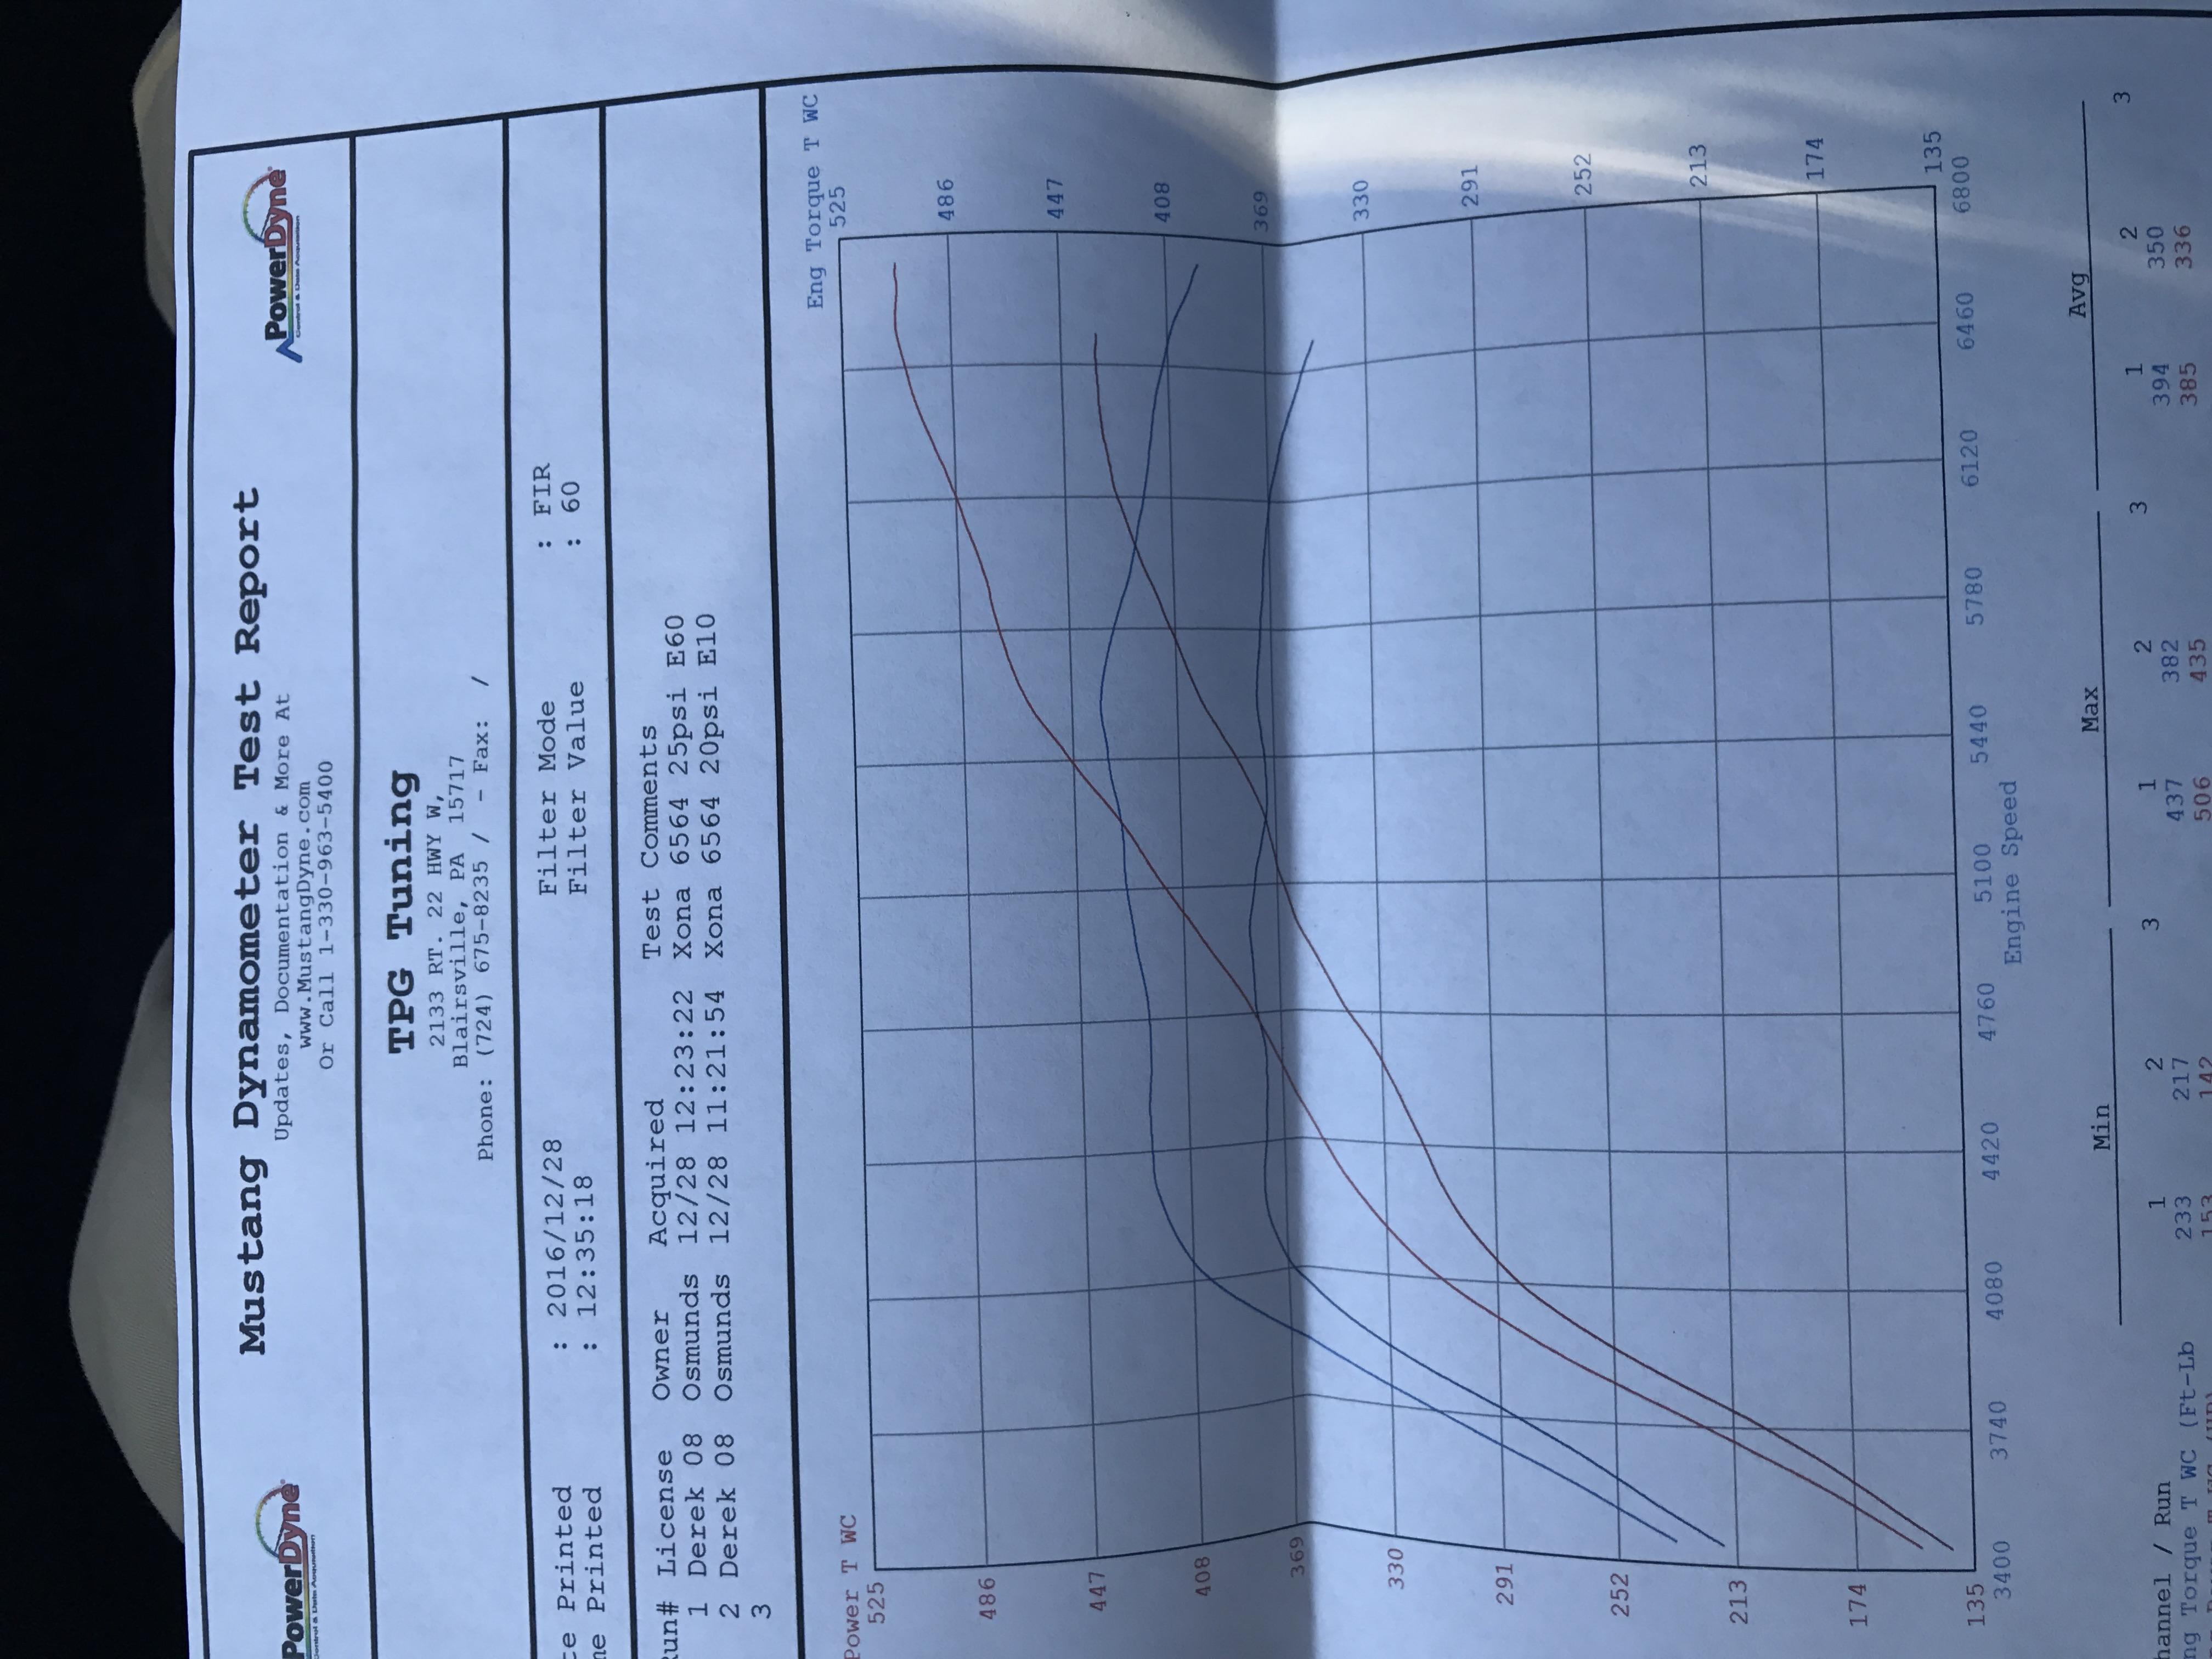 520 Whp 08 STi Hatch **Lots of extras** 18.5k OBO-img_4507-jpg